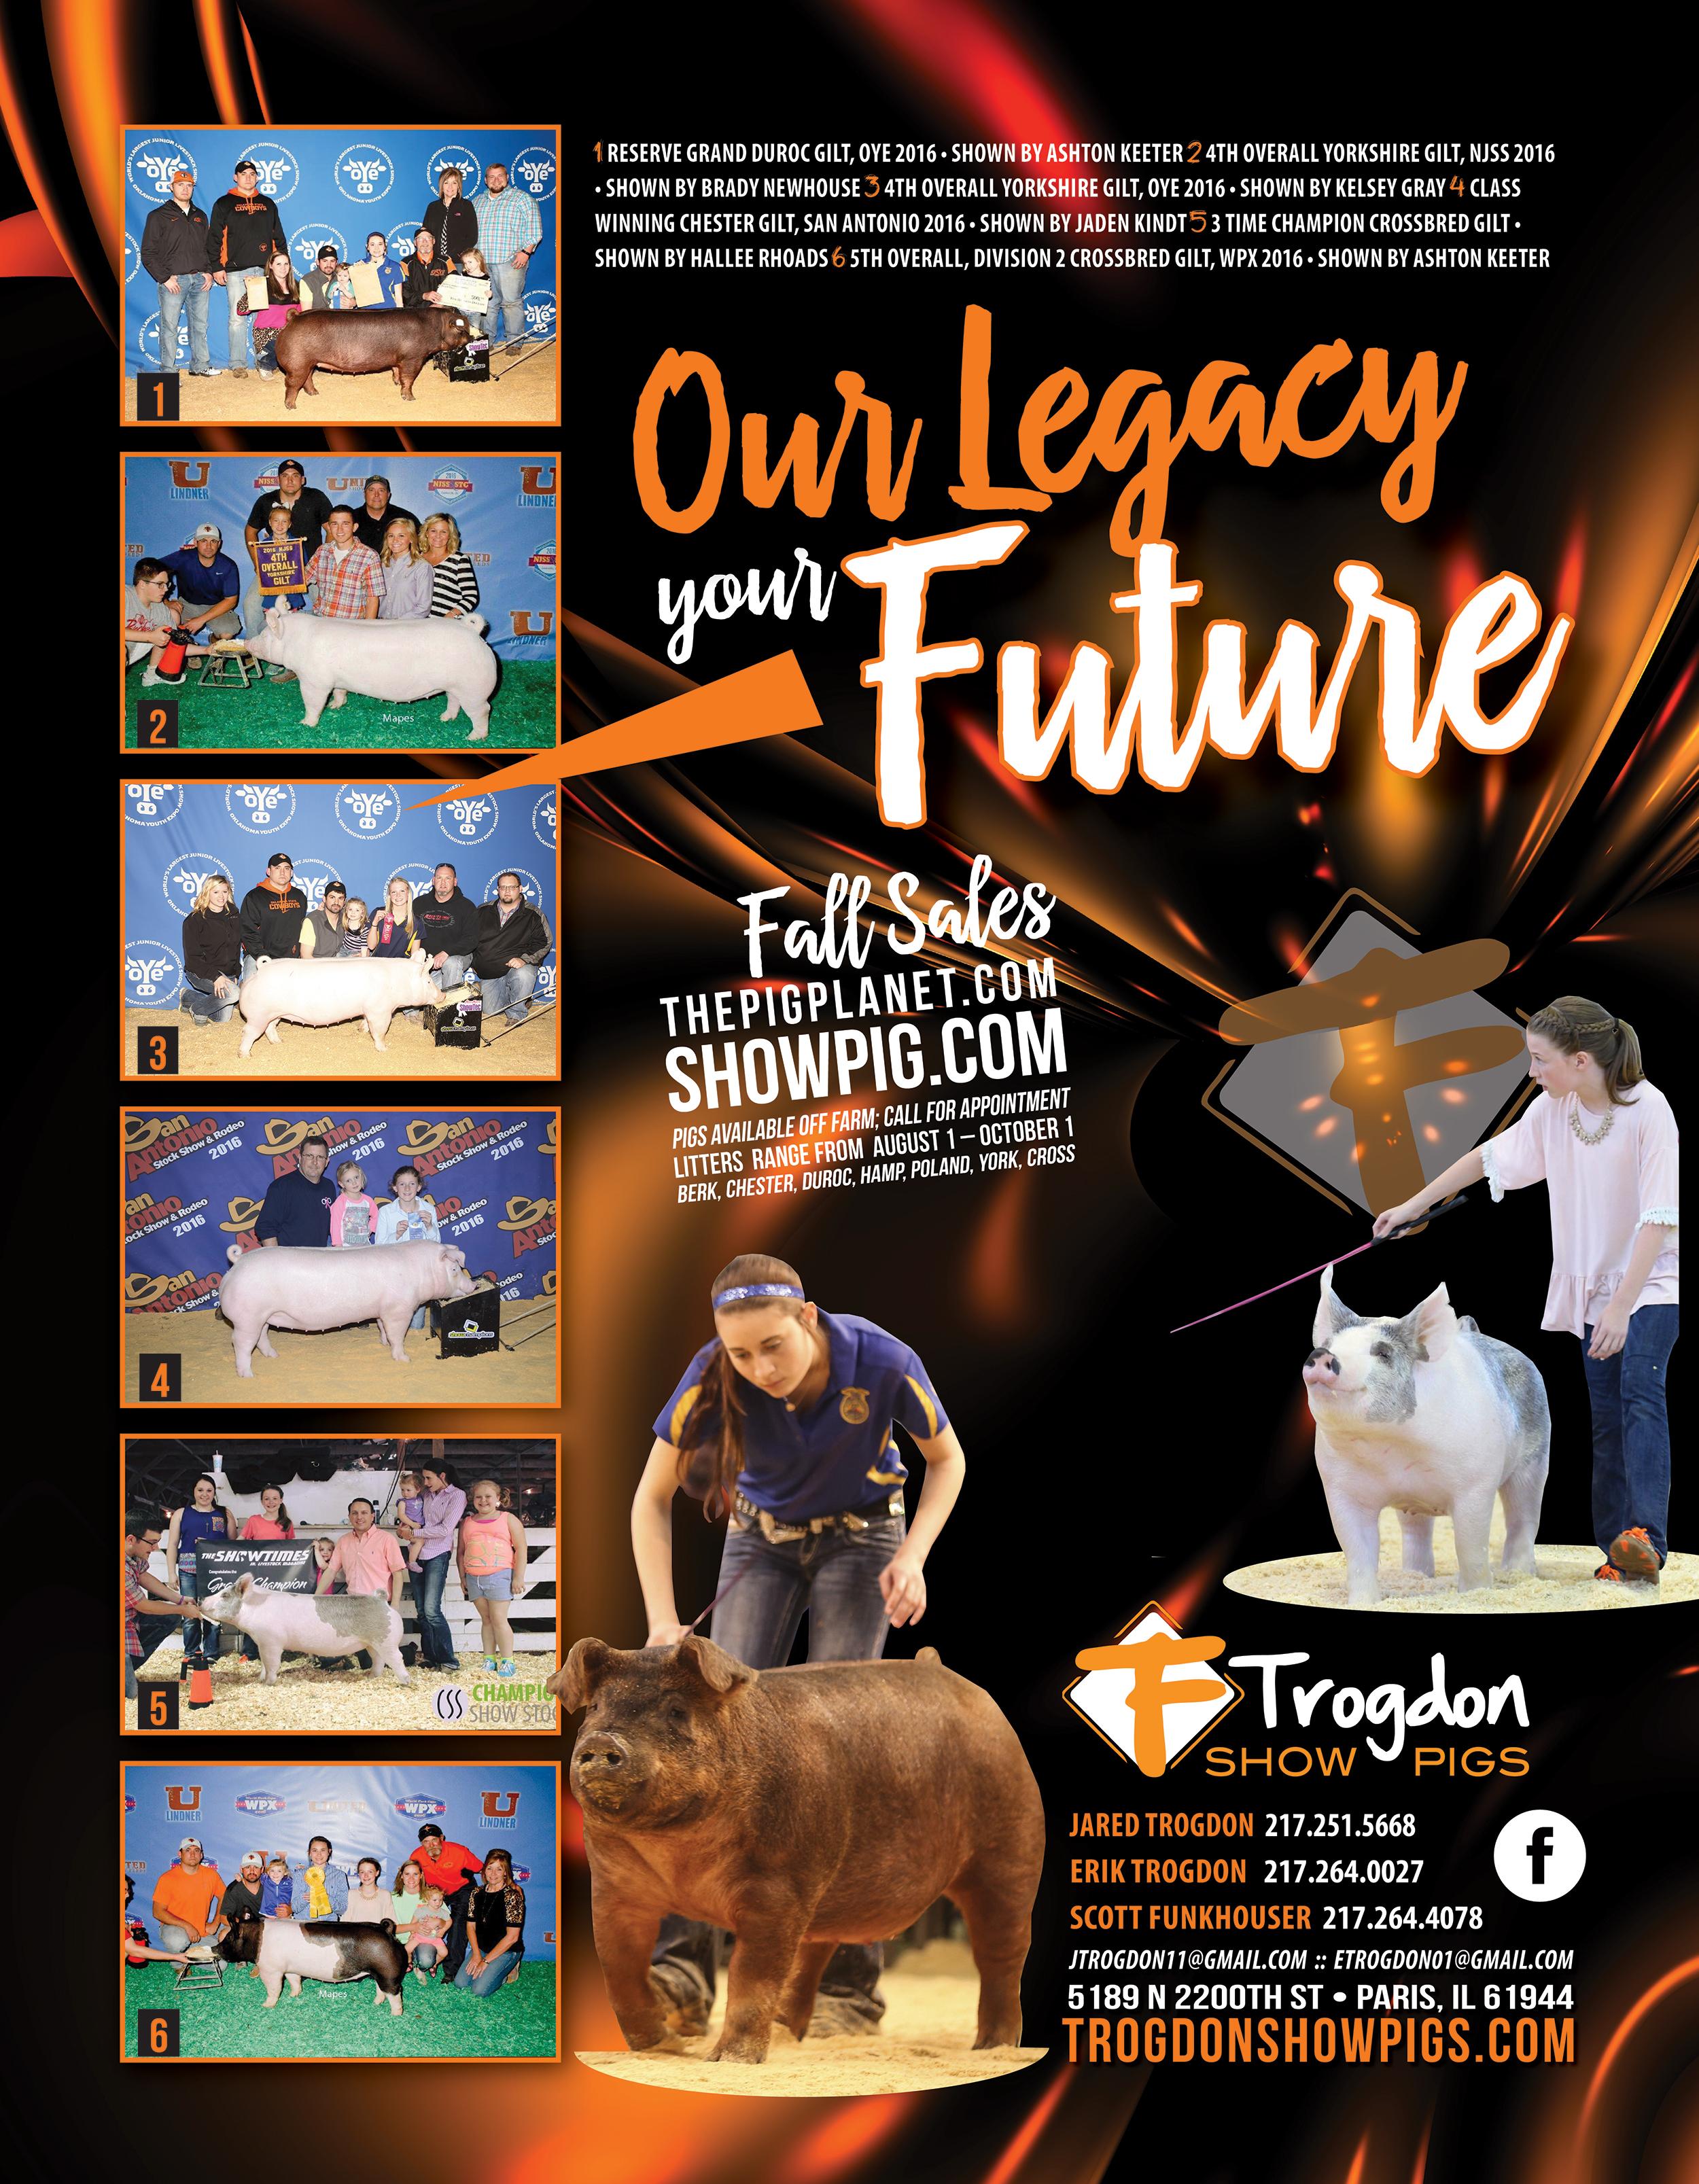 Trogdon-Show-Pigs_f16_legacyfuture-advertisement.jpg